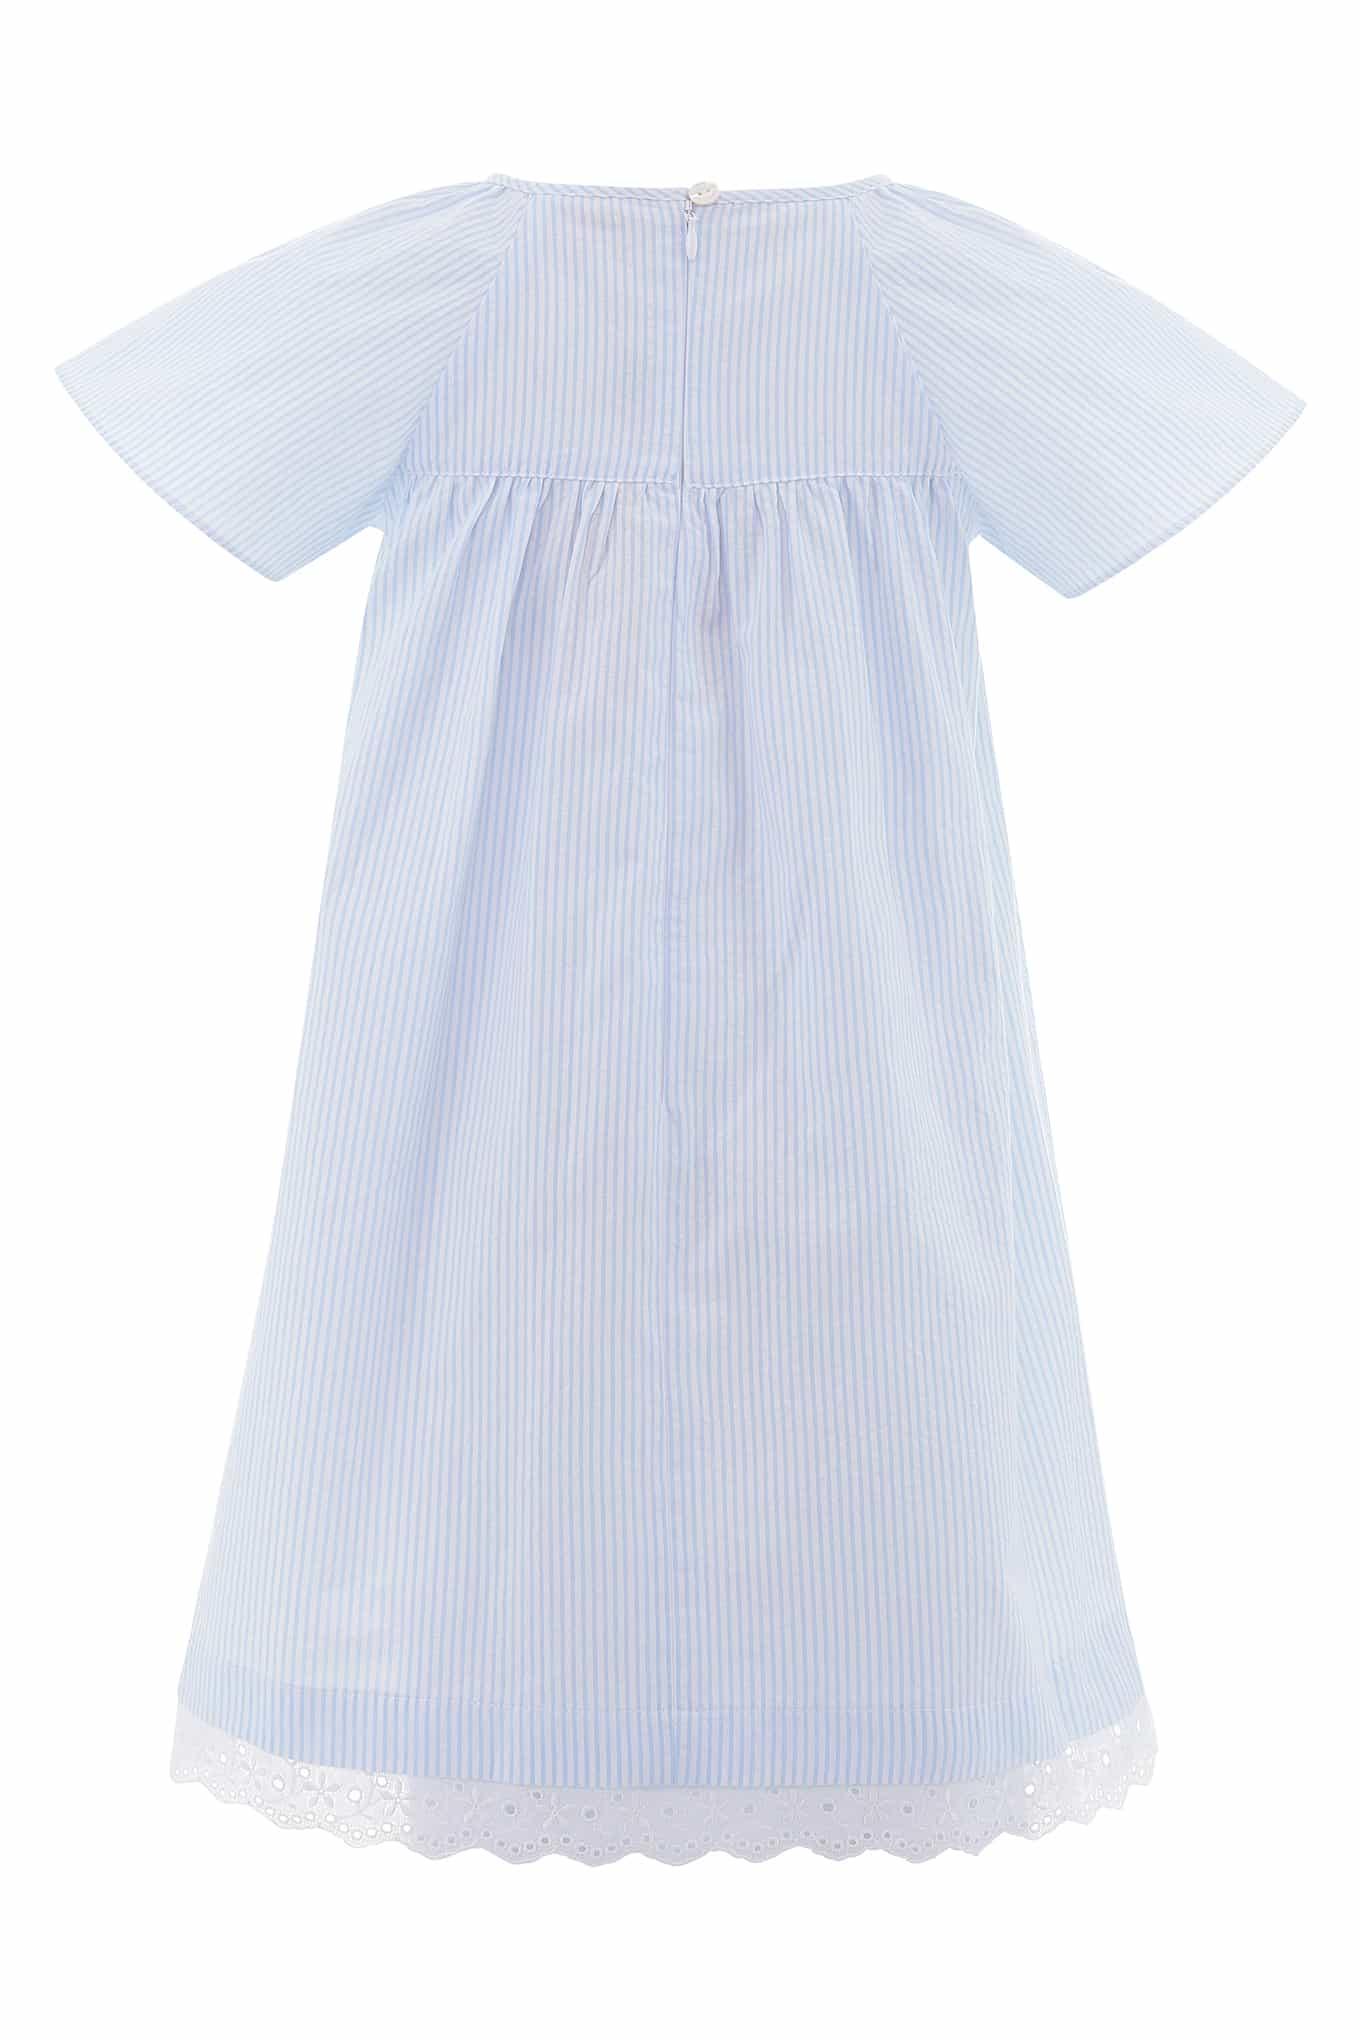 Dress Light Blue Casual Girl